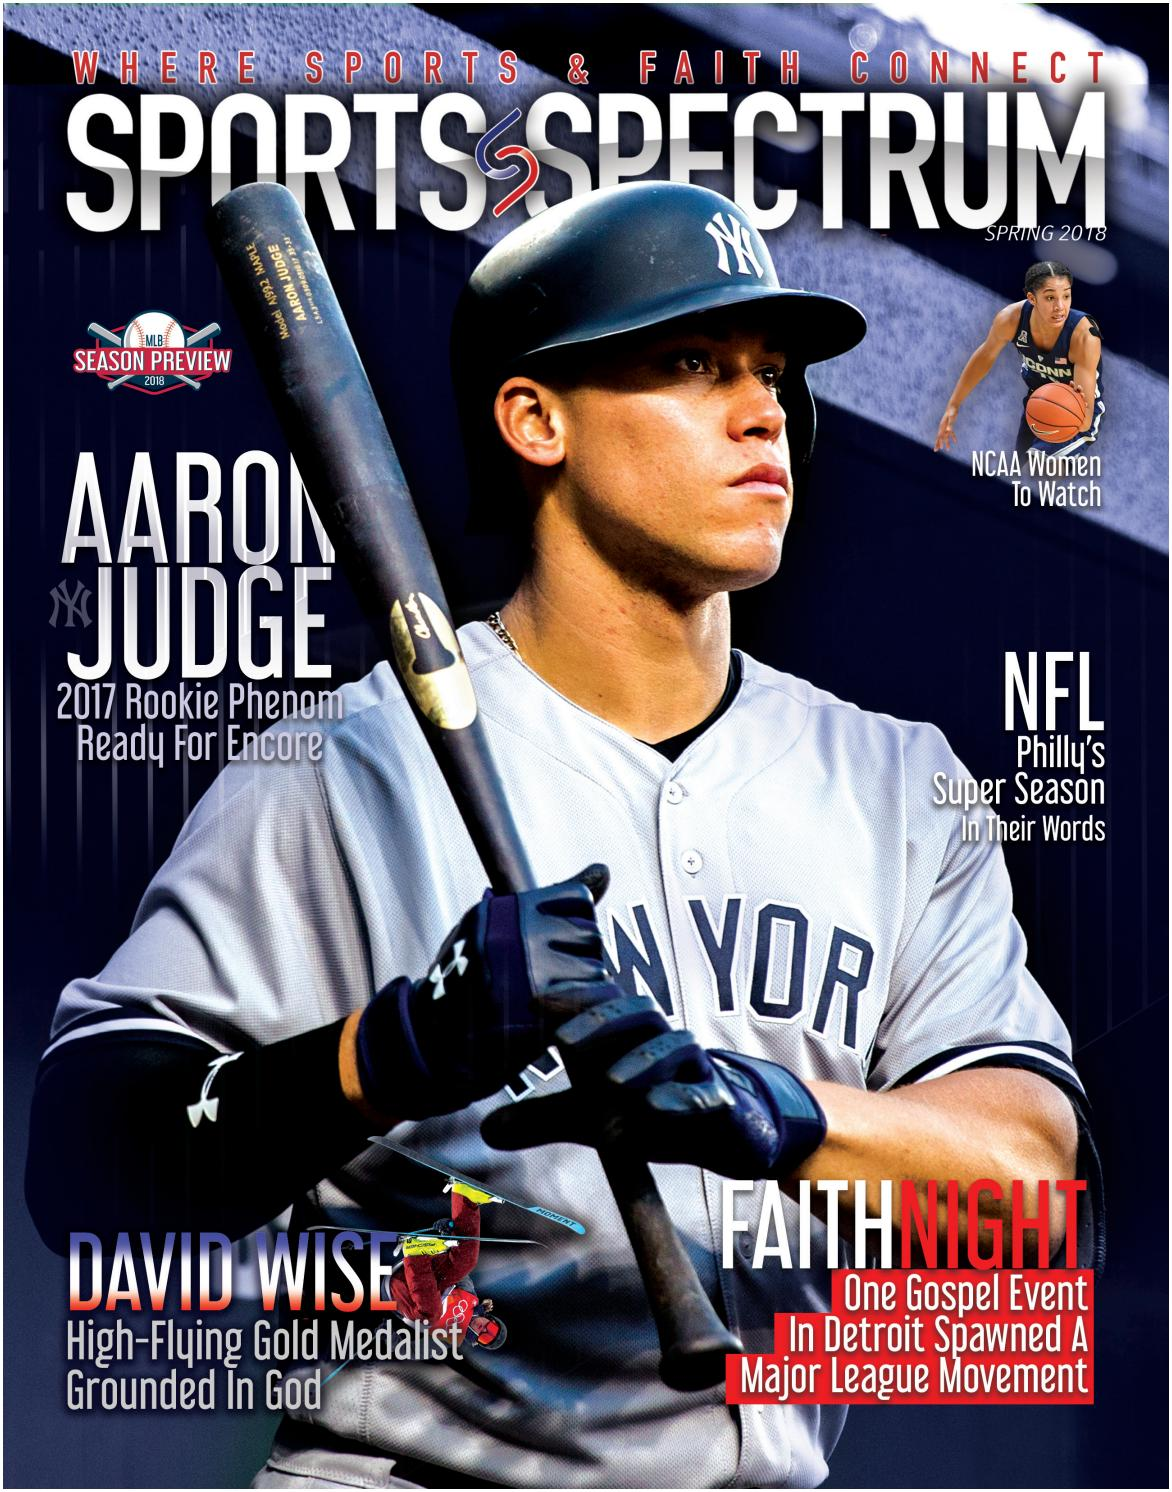 Sports Spectrum: Aaron Judge Spring 2018 Edition by Sports Spectrum - issuu